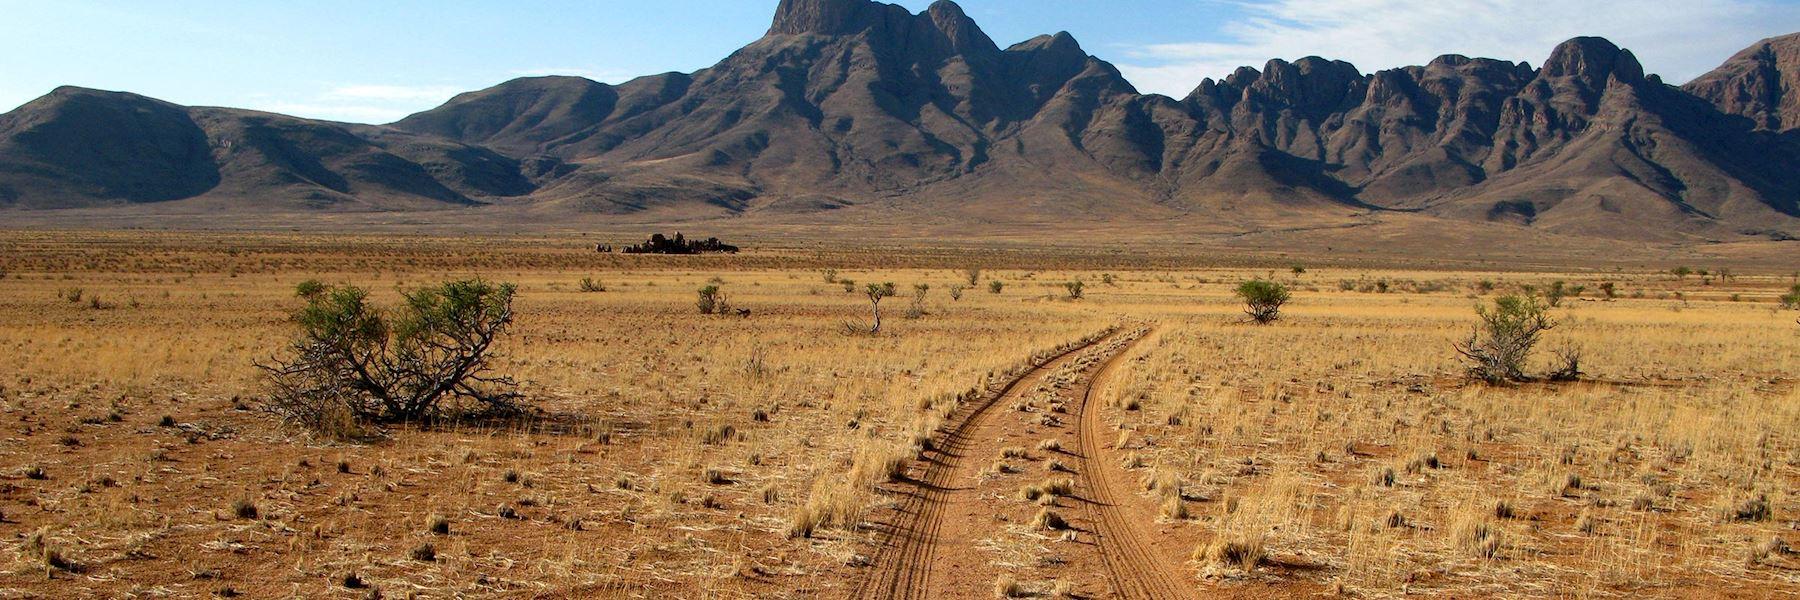 Visit the NamibRand Nature Reserve, Namibia